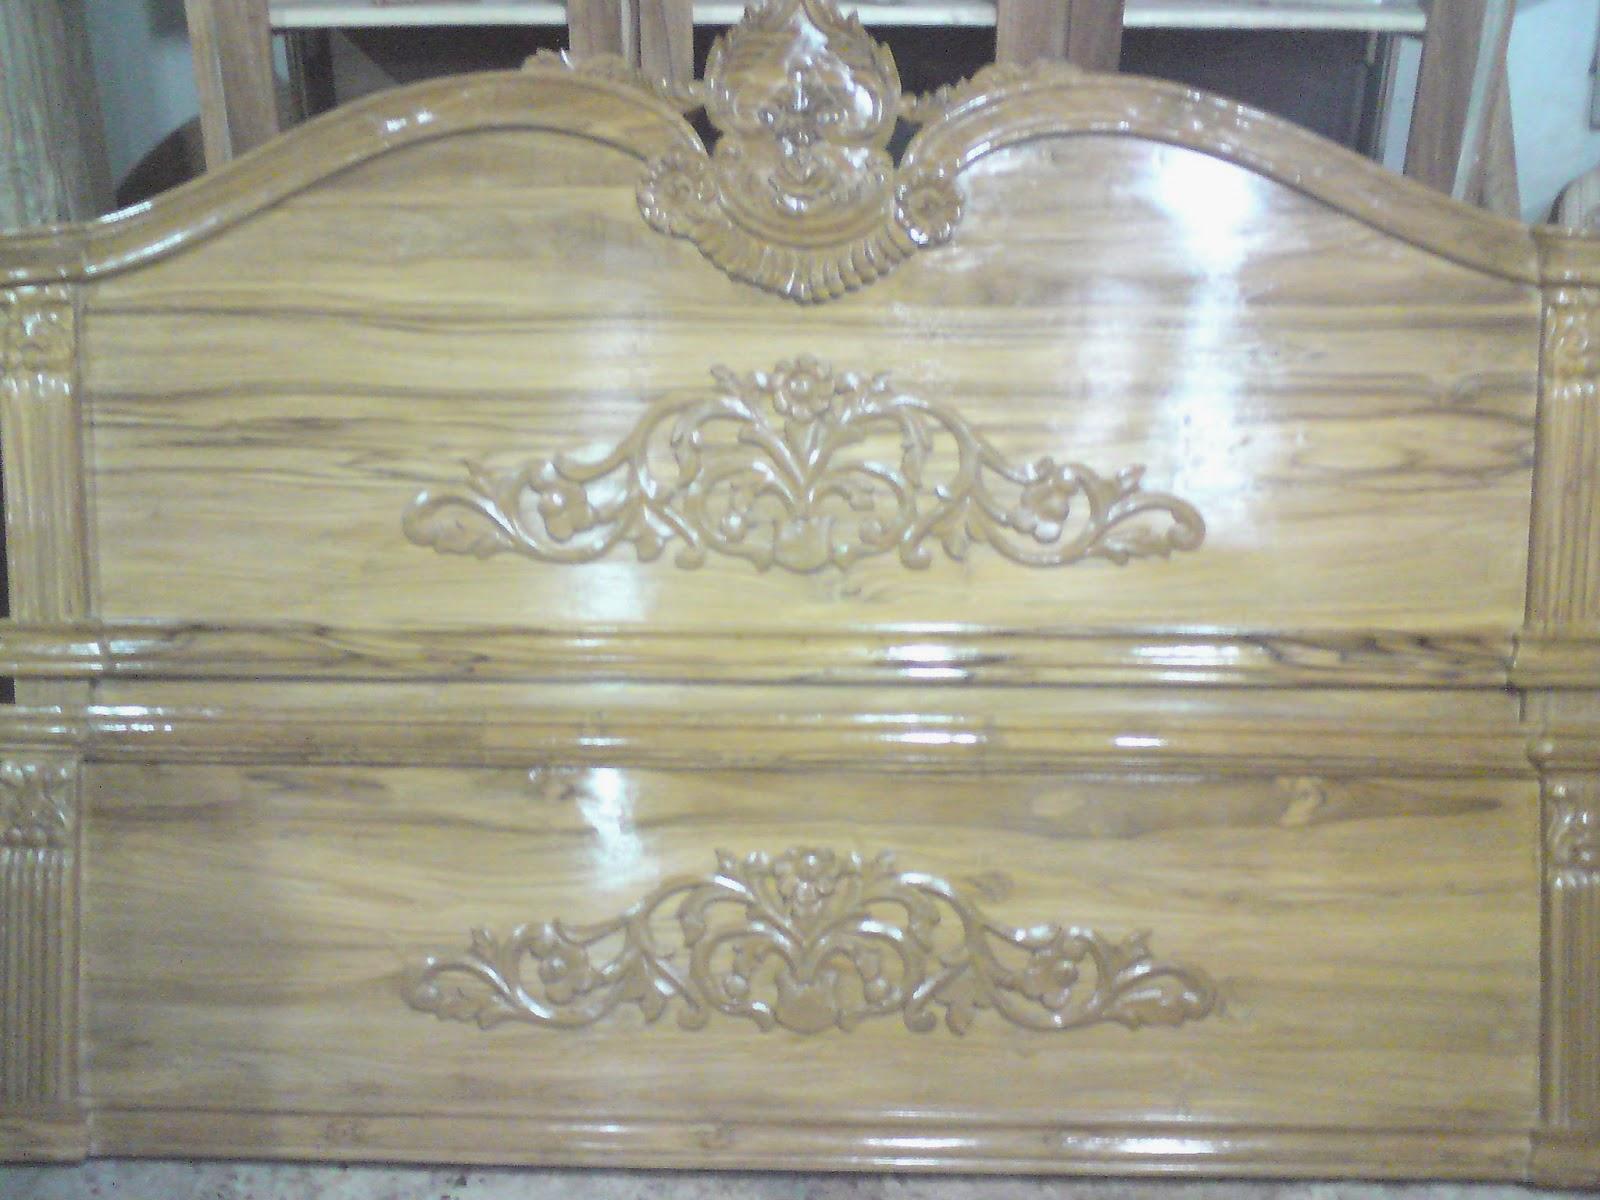 Online Furniture Sale: Box Khat